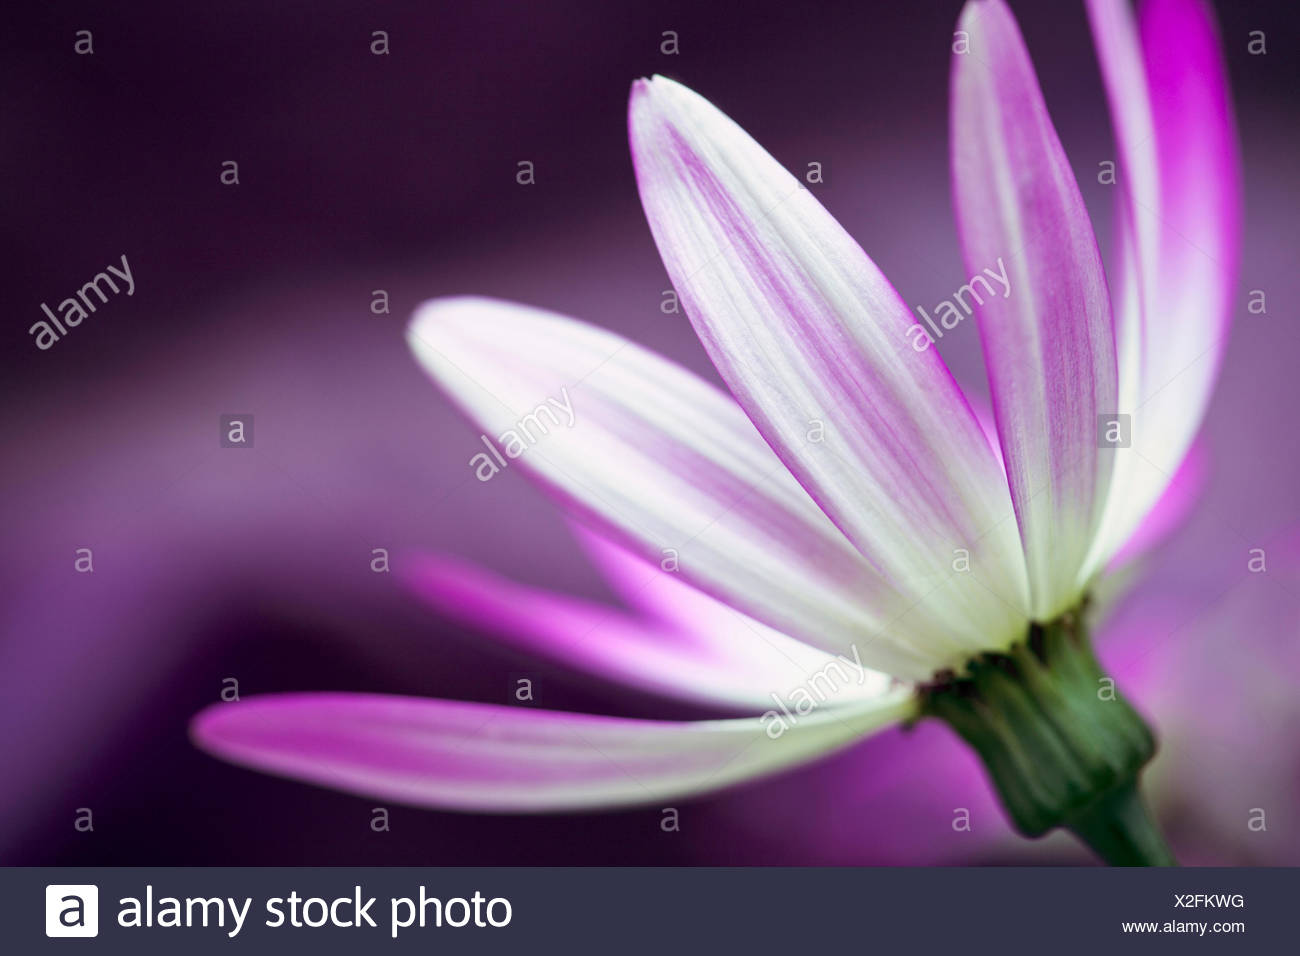 Cineraria, Pericallis x hybrida Senetti baby Magenta Bicolor 'Sunseneribuba', Close side view of one pink flower with white streaks. - Stock Image